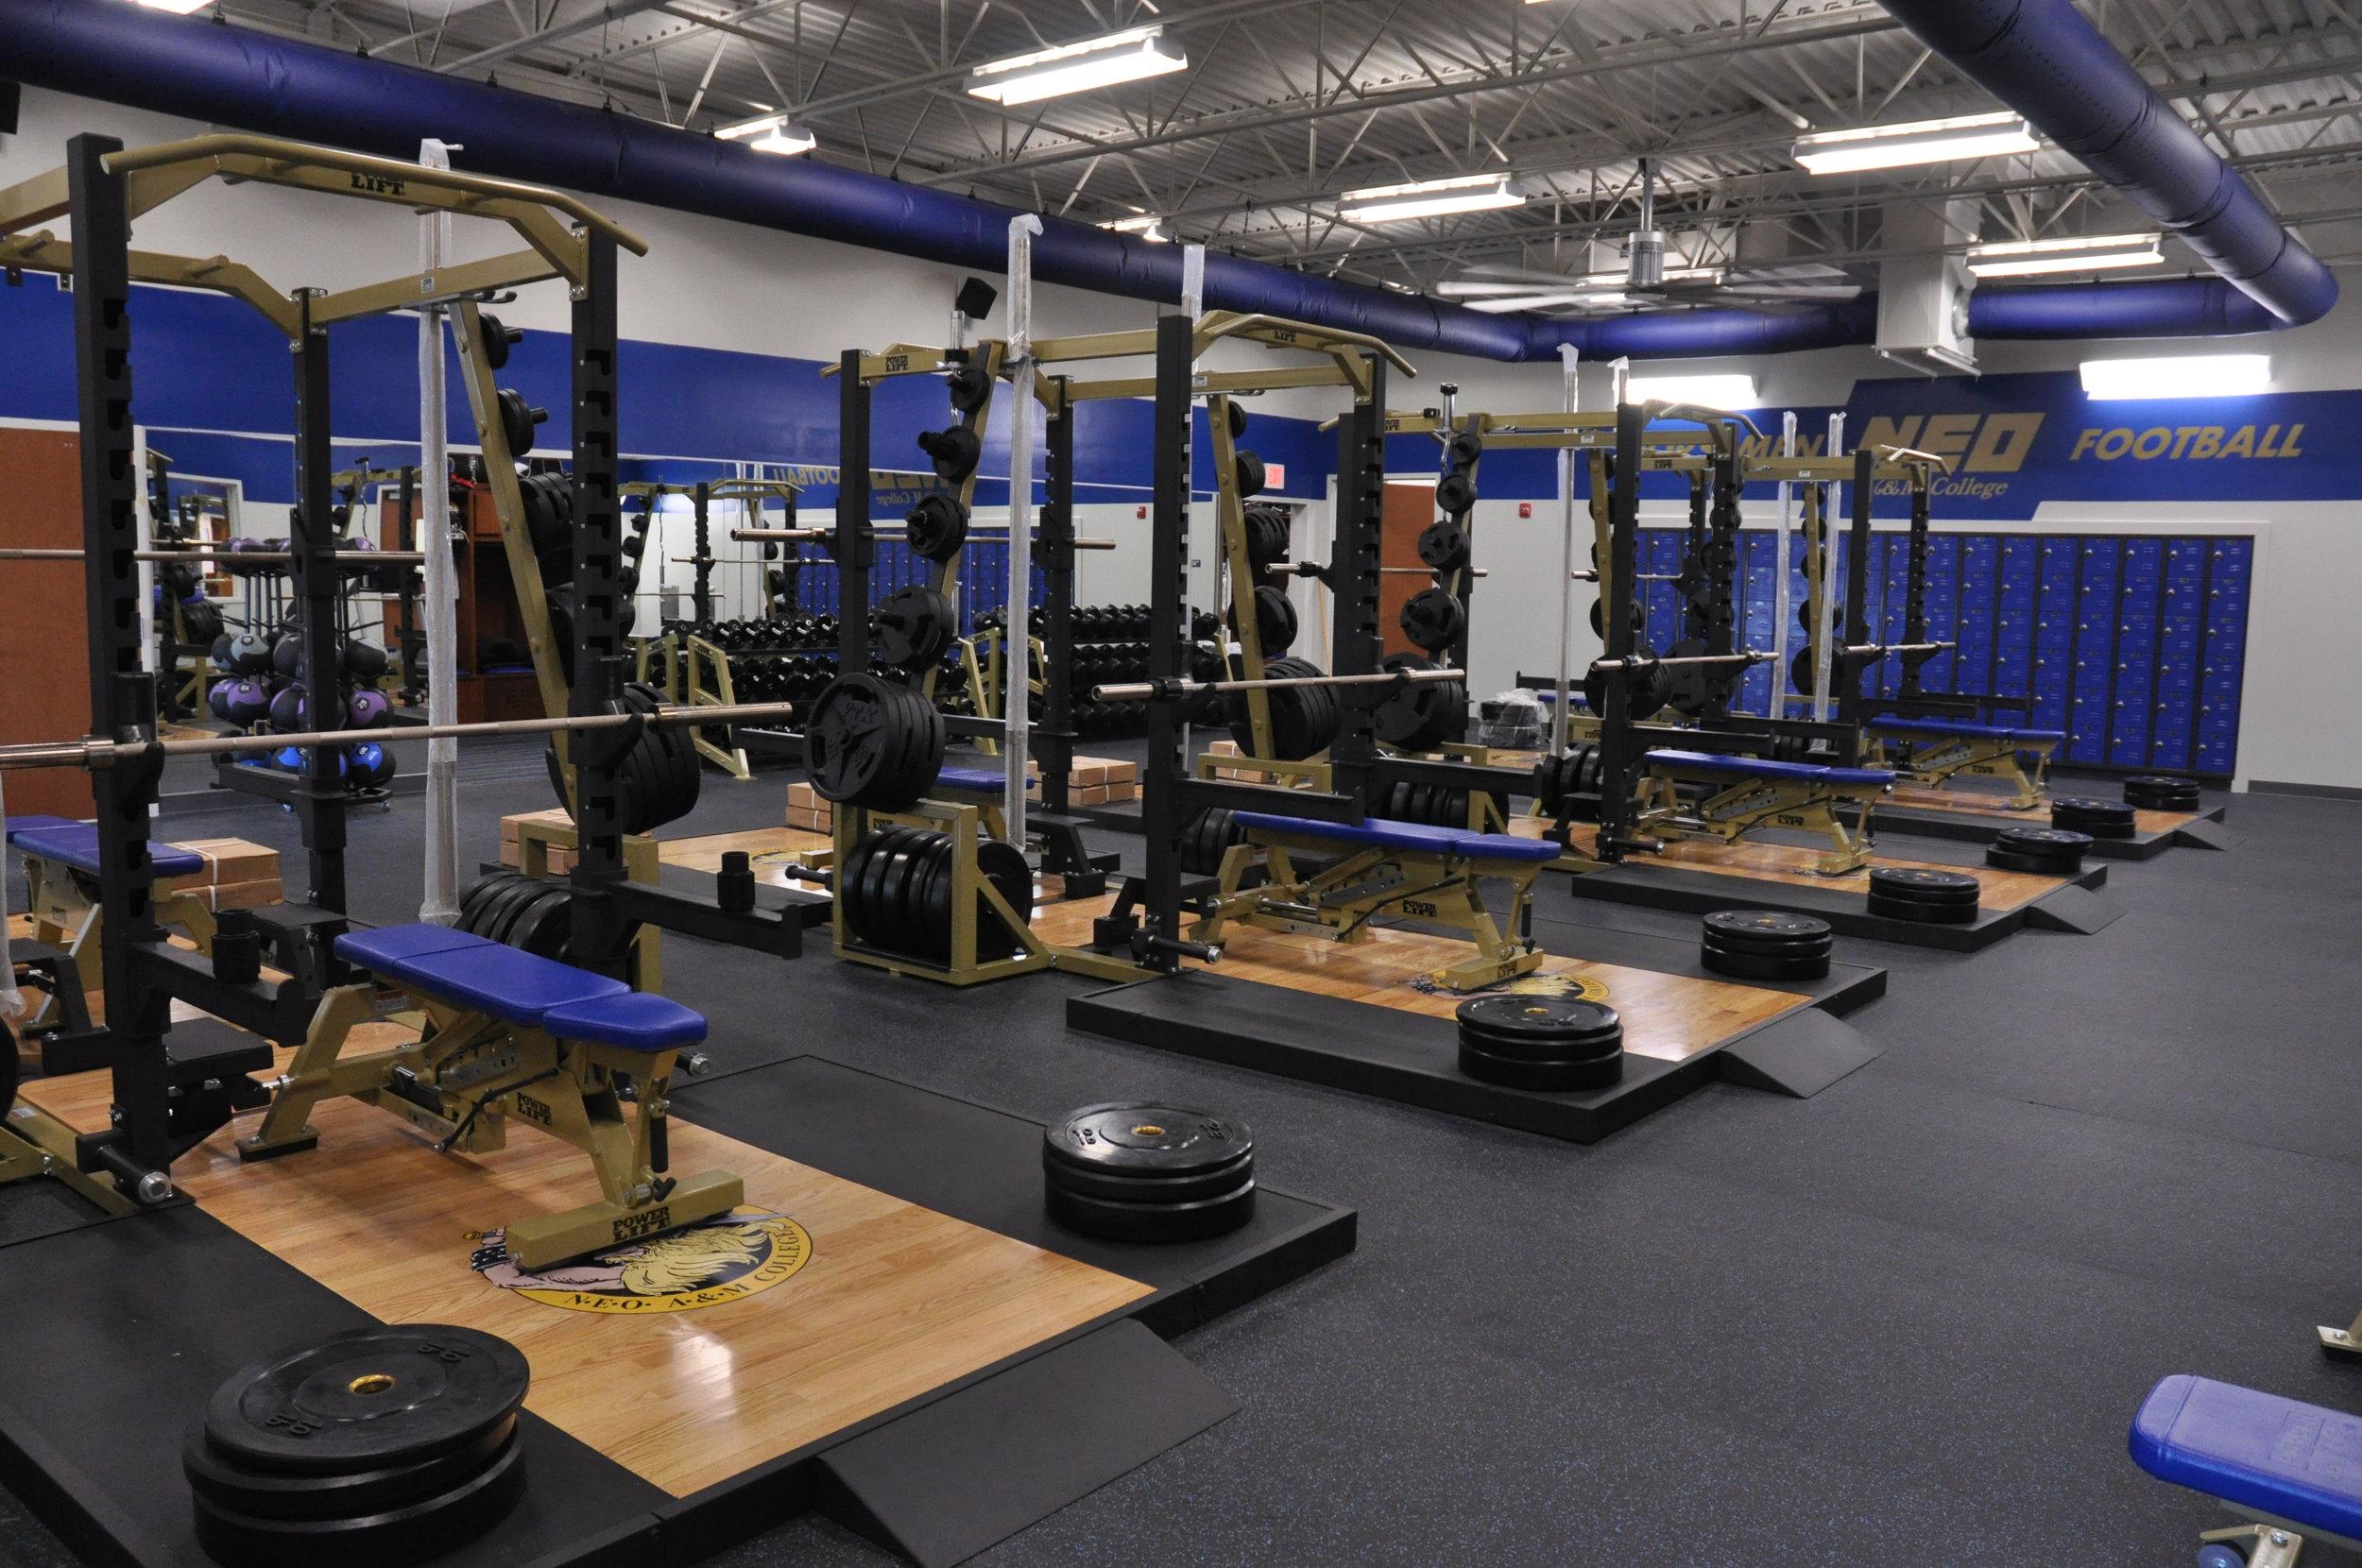 NEO Athletic Training Facility